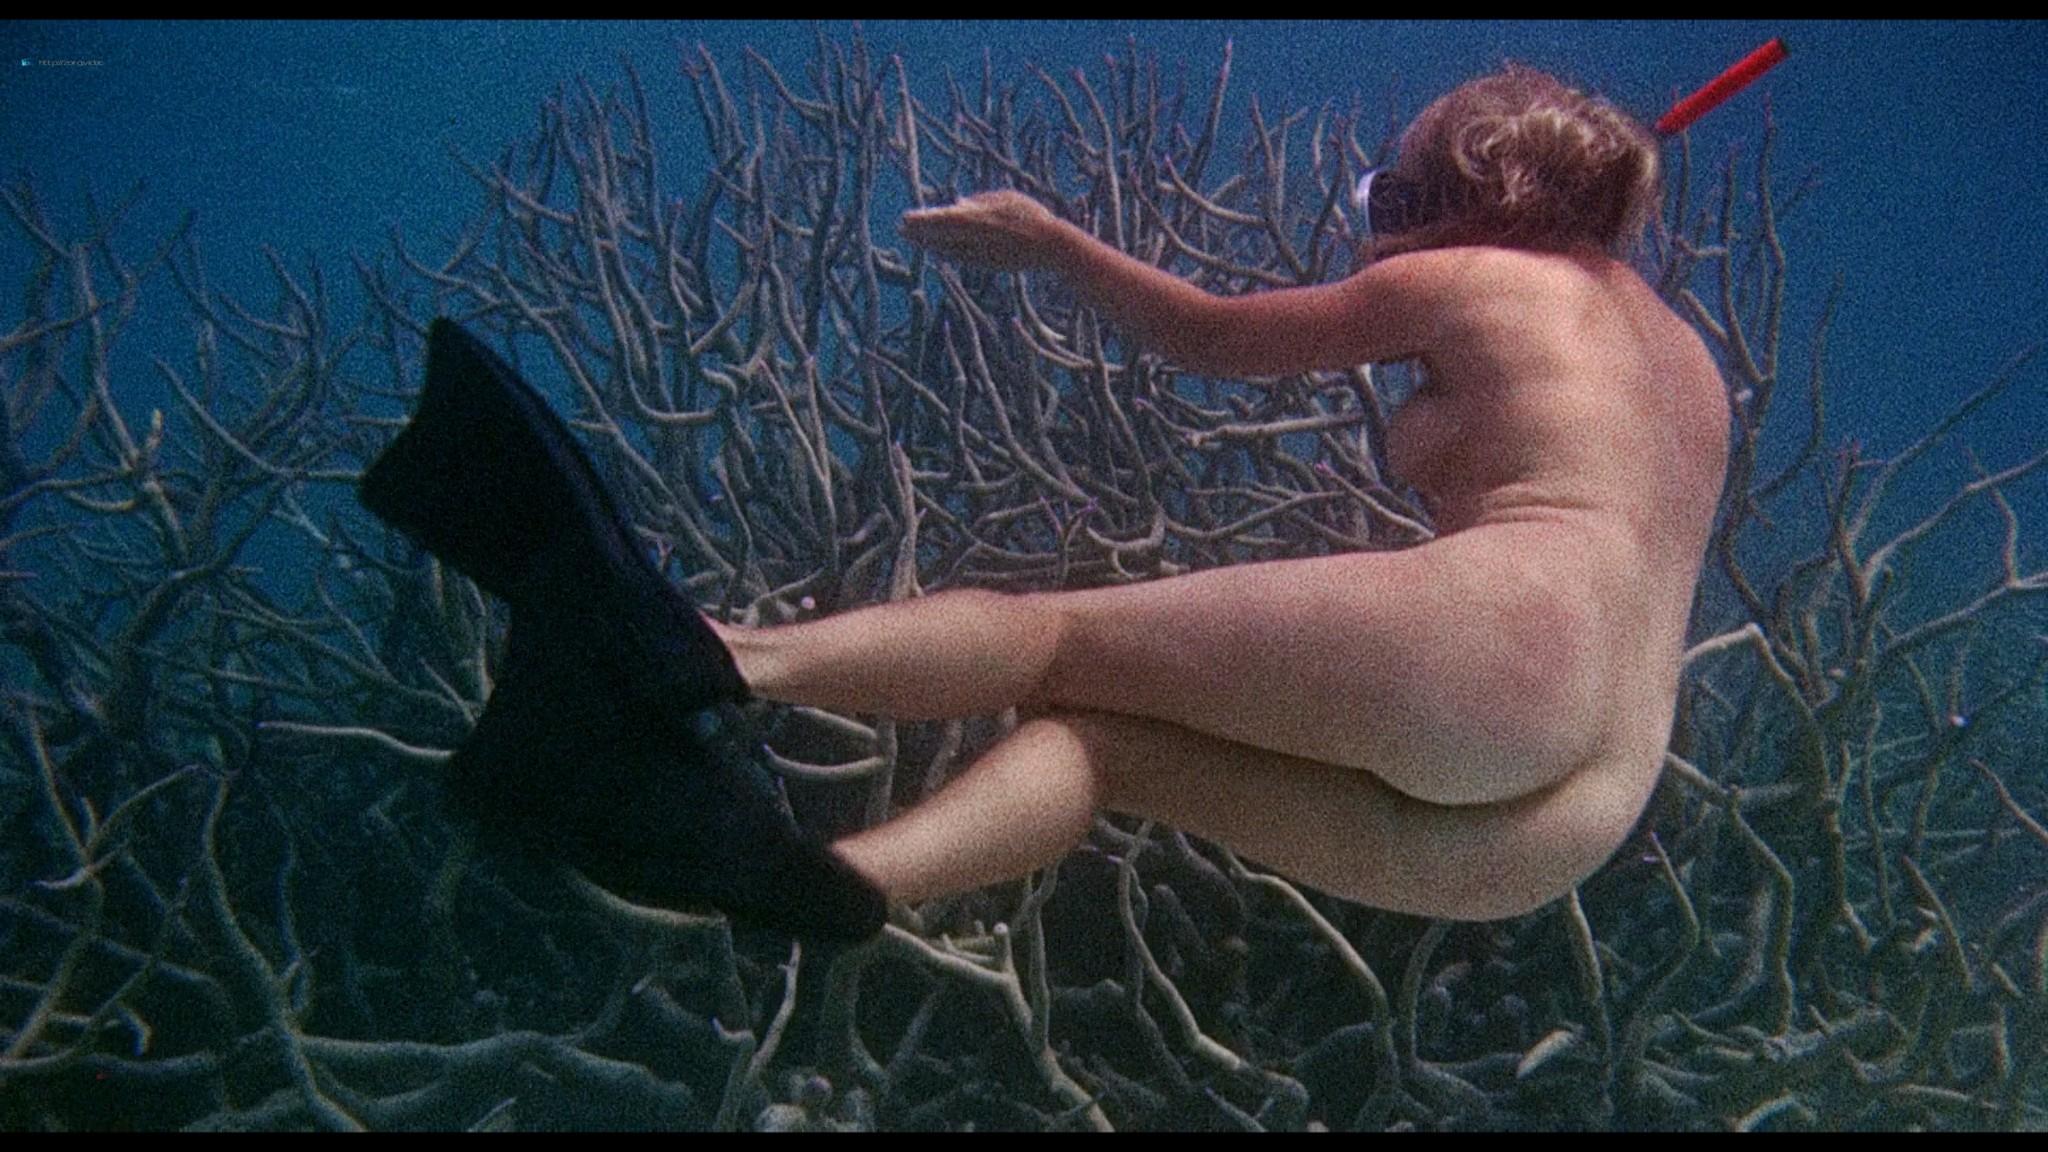 Helen Mirren nude skinny dipping Clarissa Kaye-Mason nude sex - Age of Consent (1969) HD 1080p BluRay Remux (9)